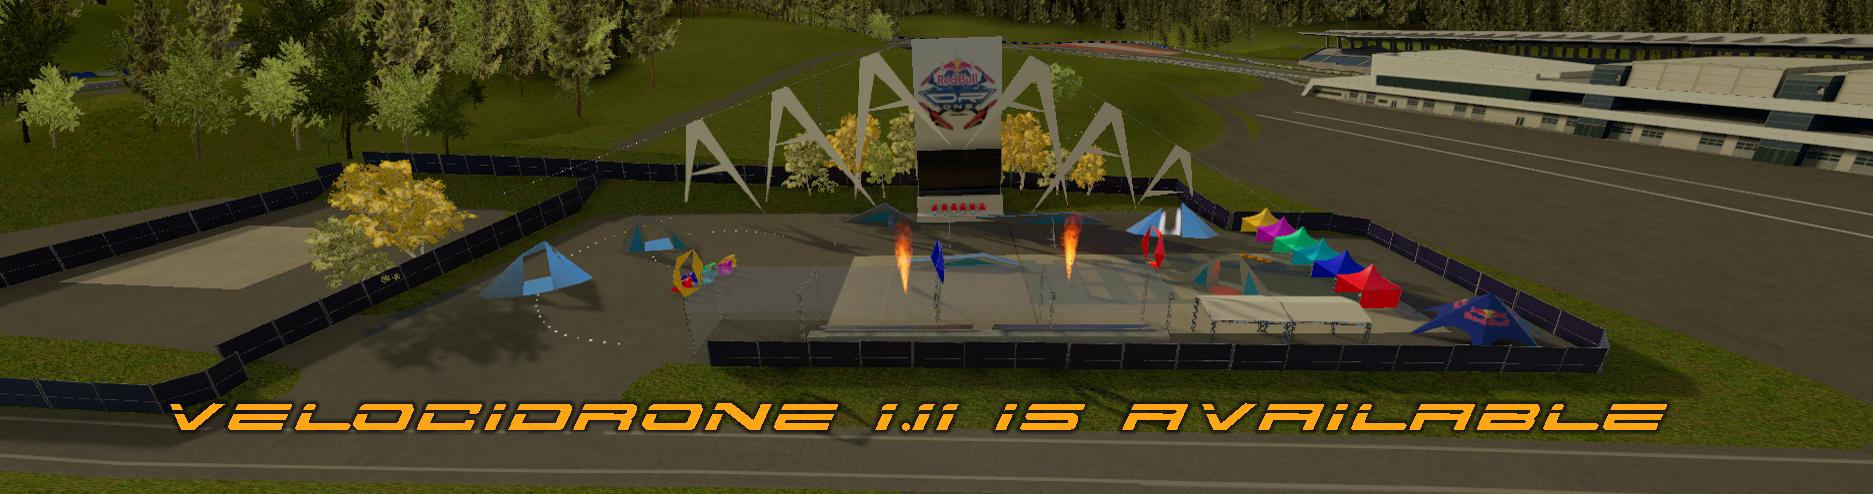 VelociDrone FPV Racing Simulator 1.11